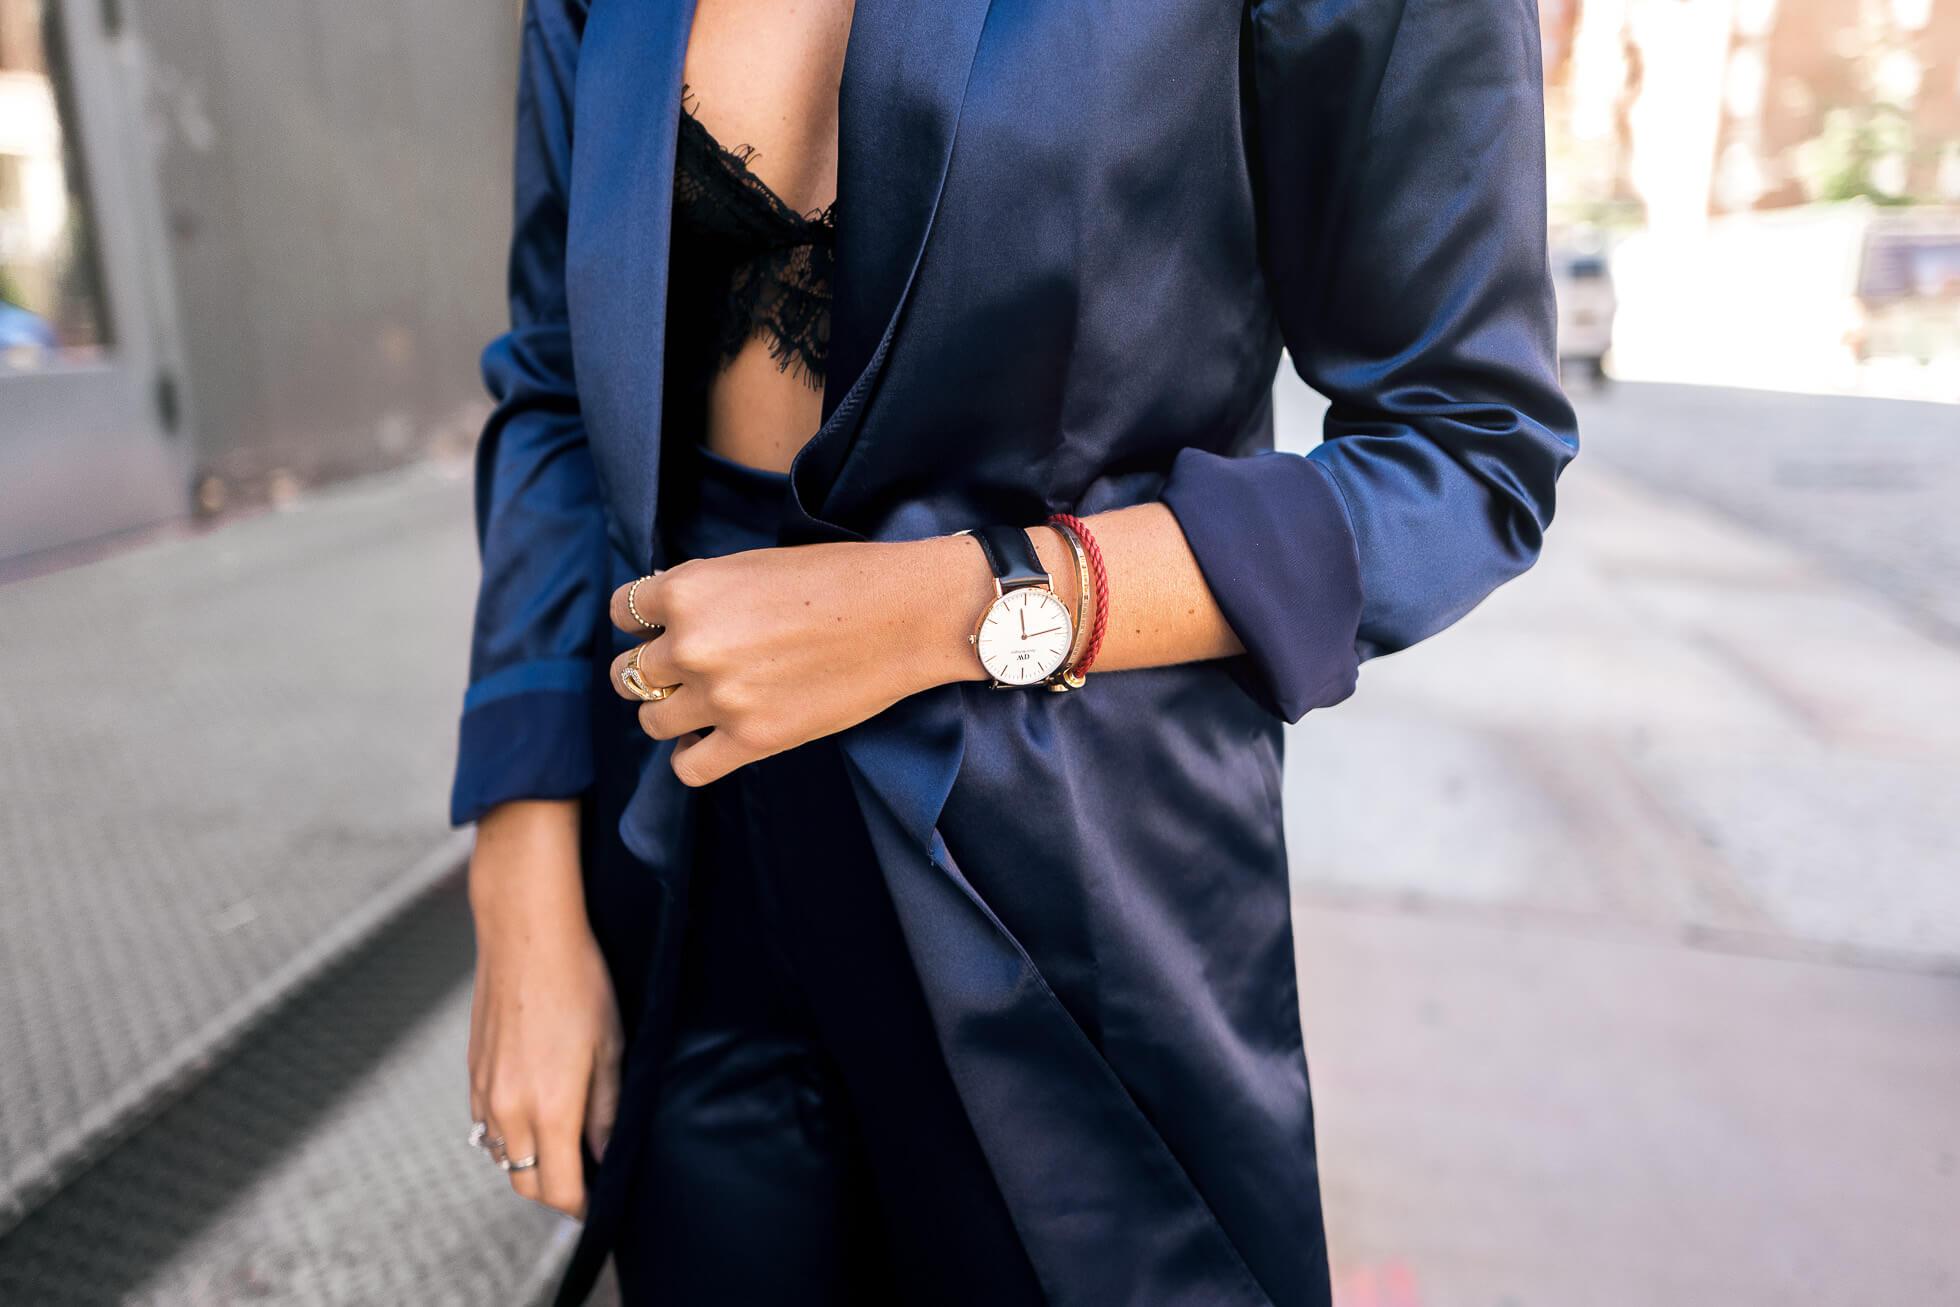 janni-deler-blue-suitL1090307-Redigera-Redigera